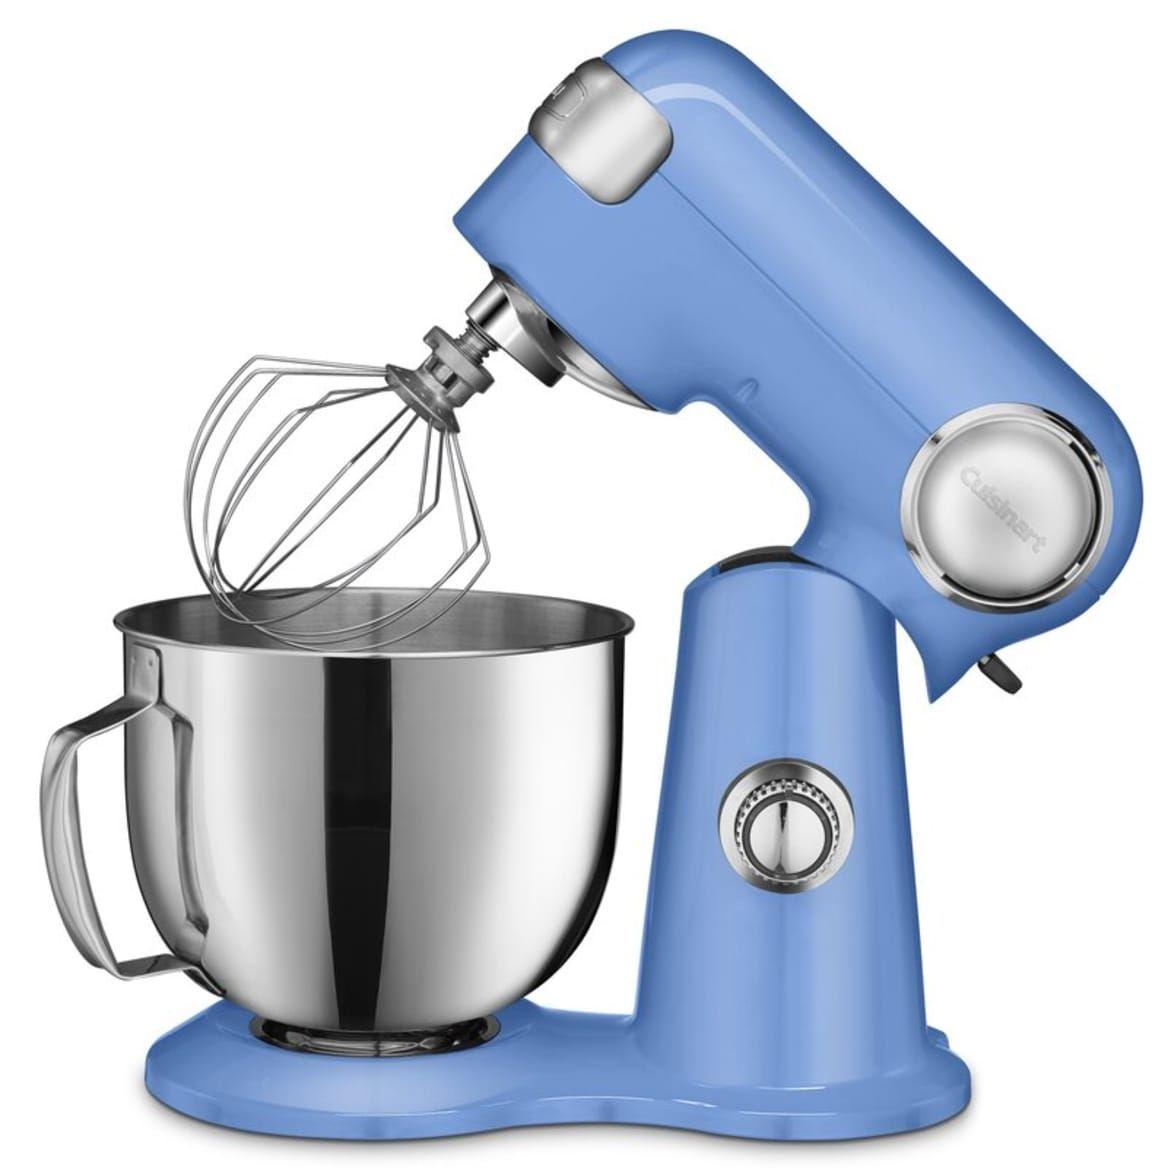 Cuisinart precision master 12 speed 55quart stand mixer